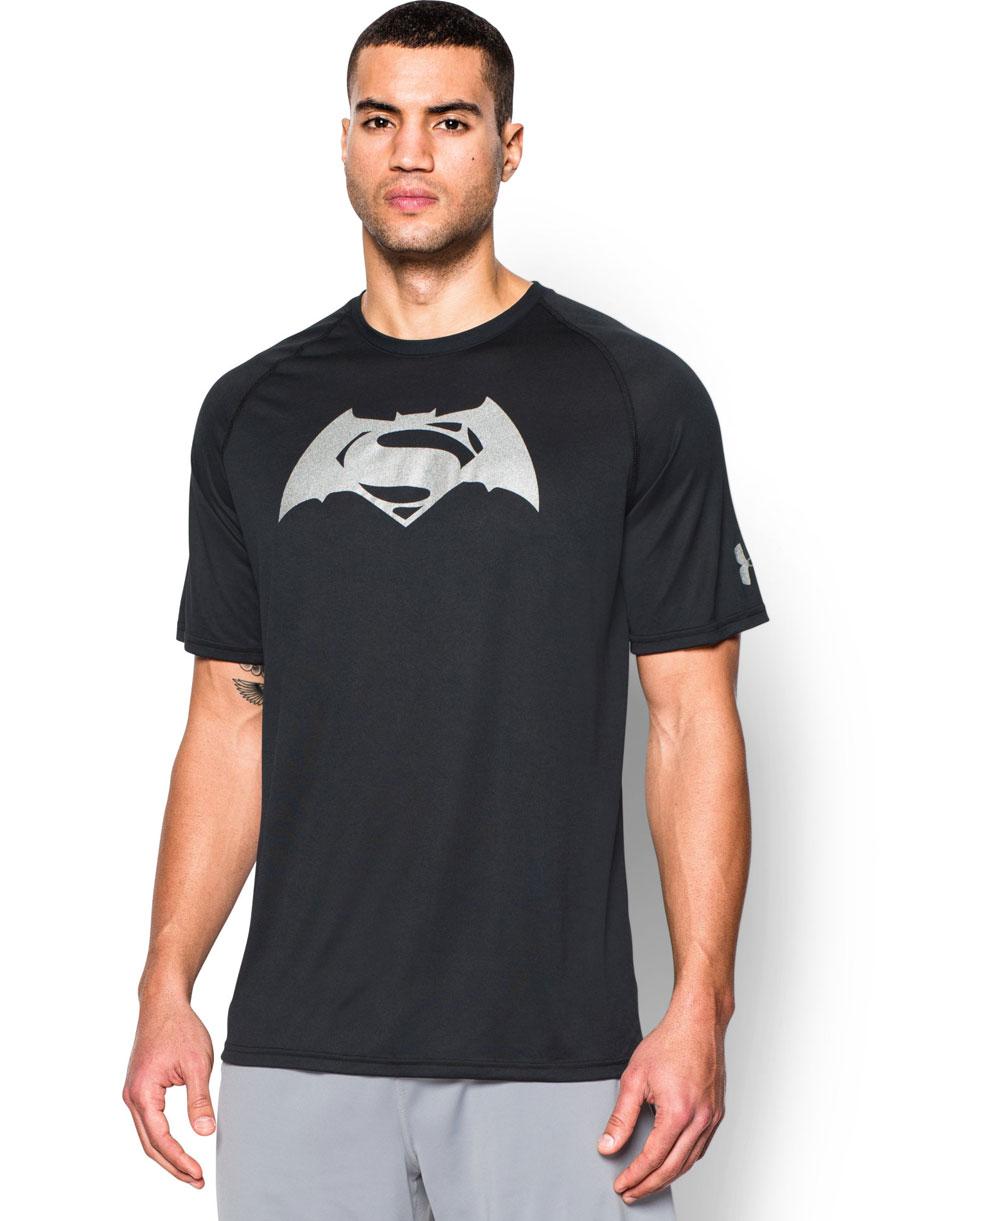 c0ef01e4 Under Armour Men's Short Sleeve T-Shirt Alter Ego Batman Vs Superma...